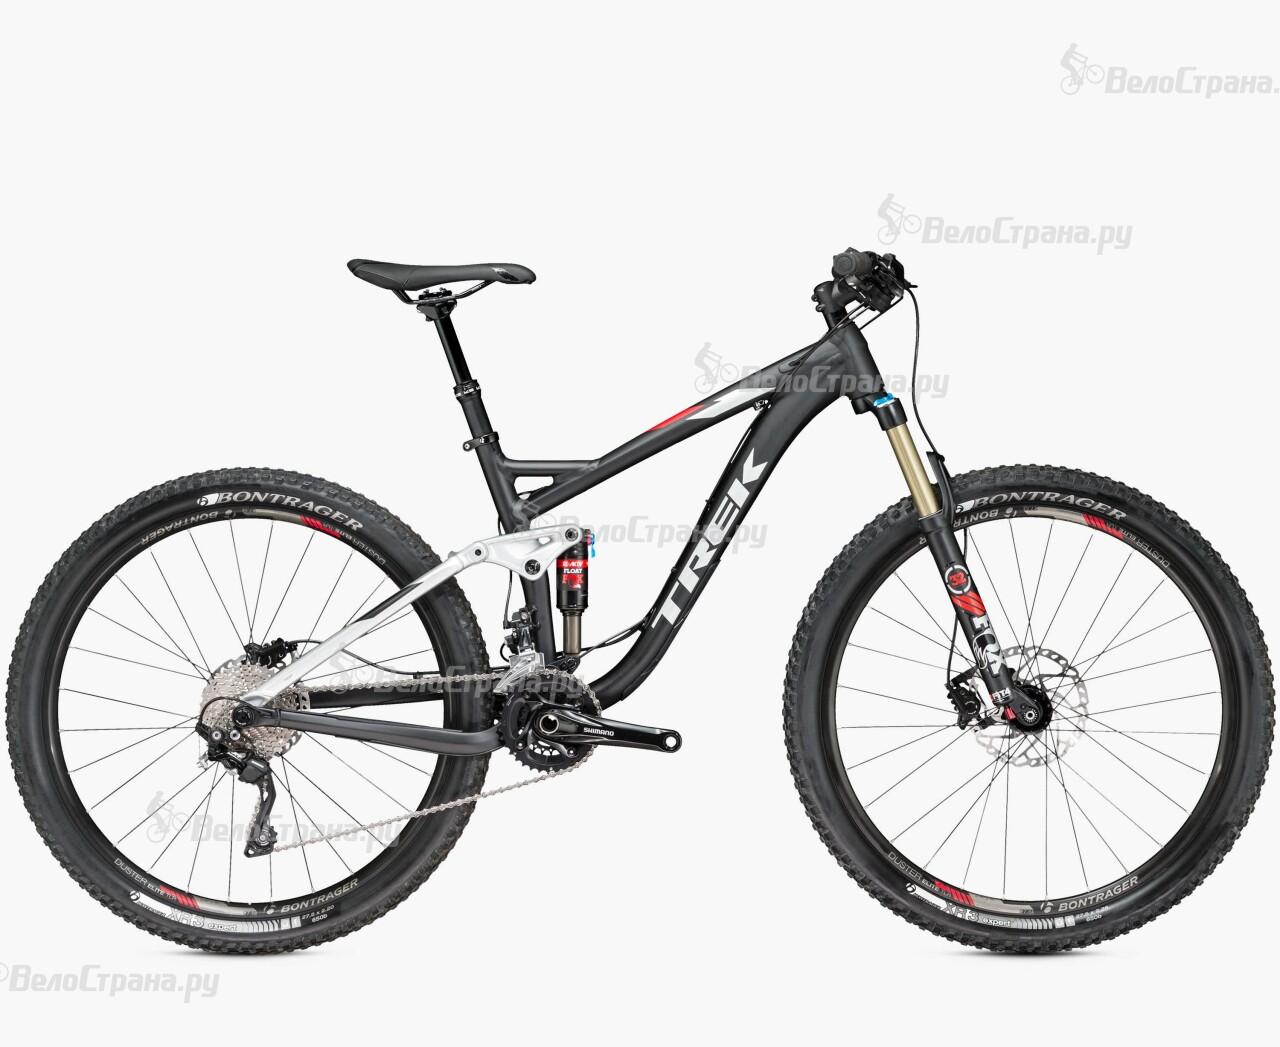 Велосипед Trek Fuel EX 8 27.5 (2016) trek fuel ex 9 27 5